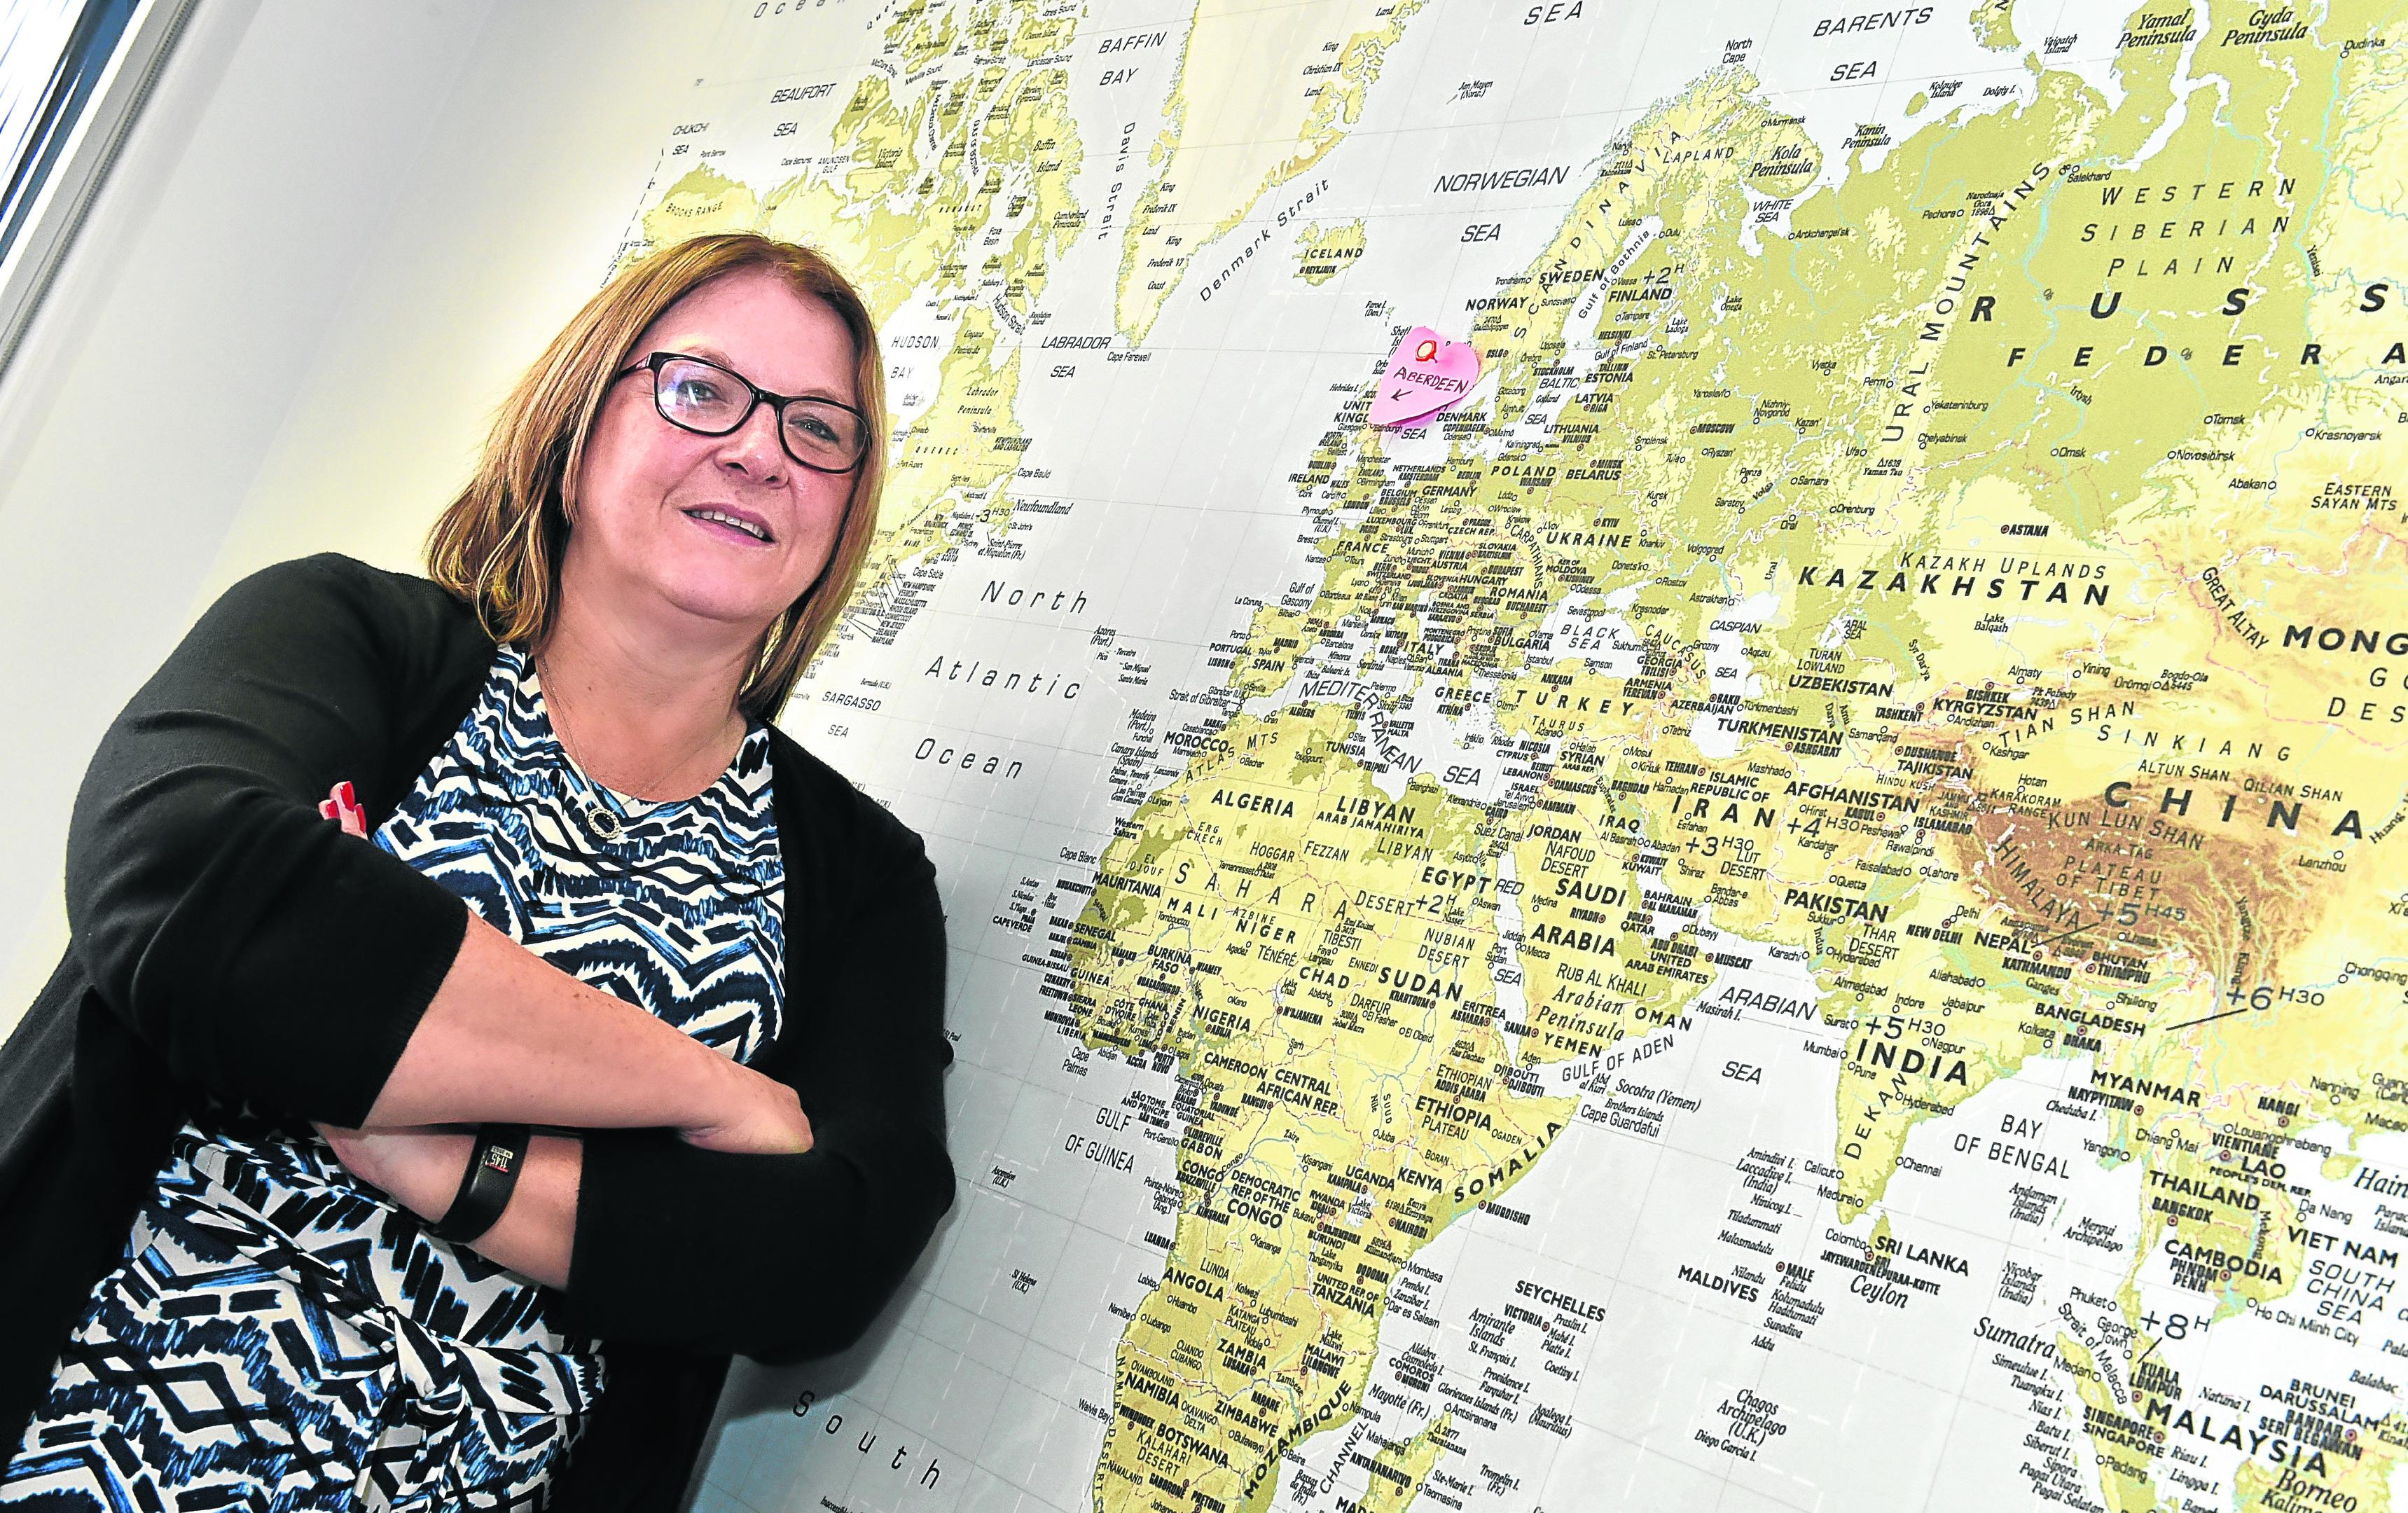 Aberdeen airport managing director Carol Benzie